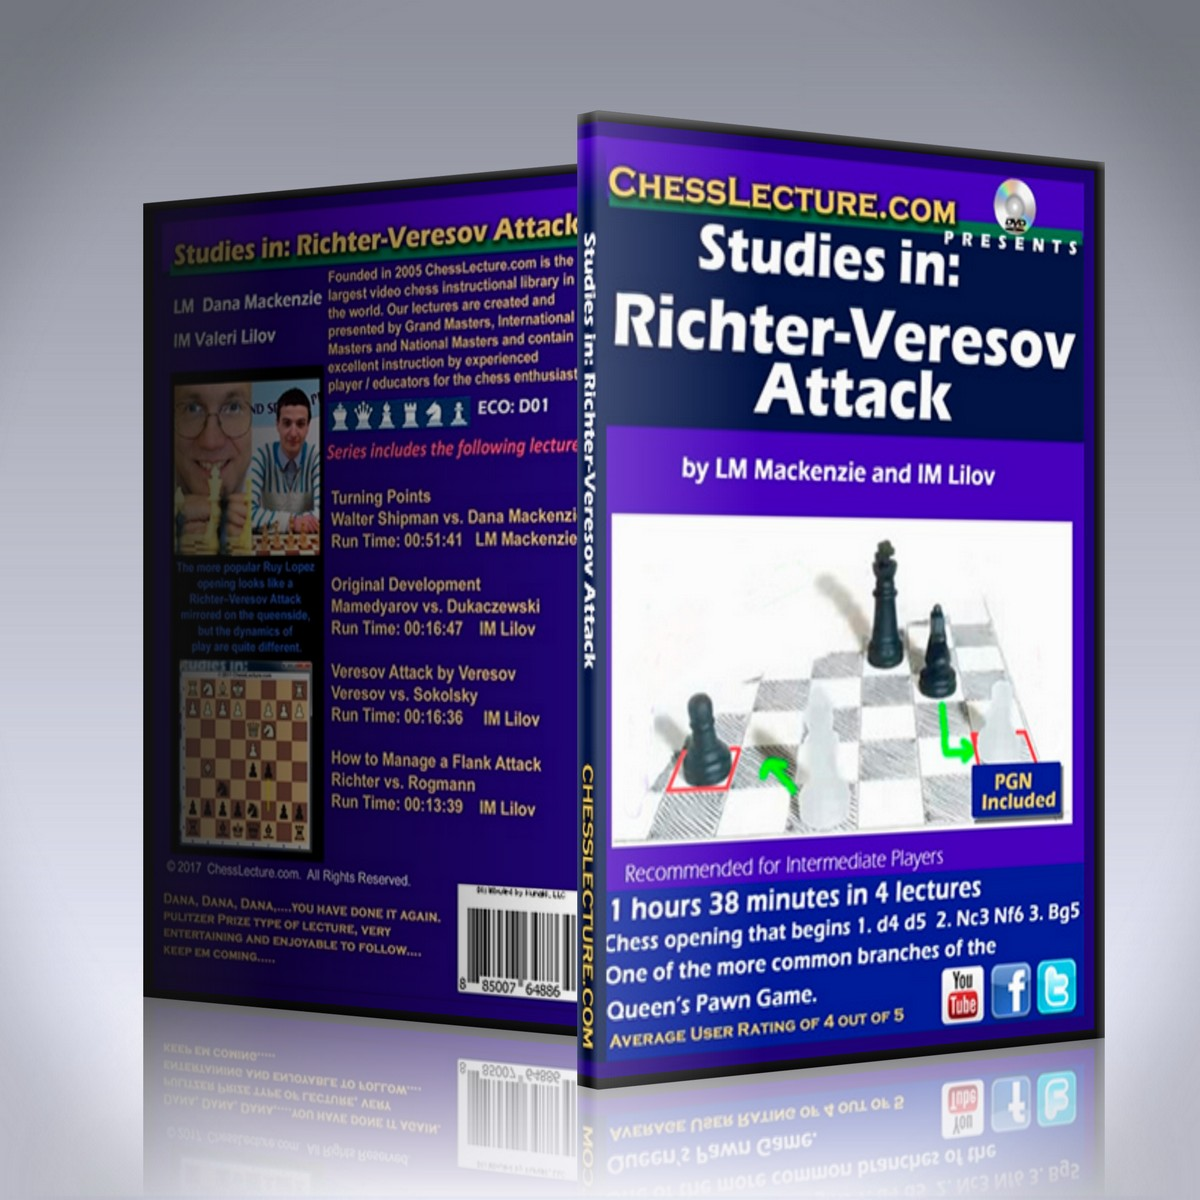 Studies in: Richter-Veresov Attack – LM Dana Mackenzie and IM Valeri Lilov